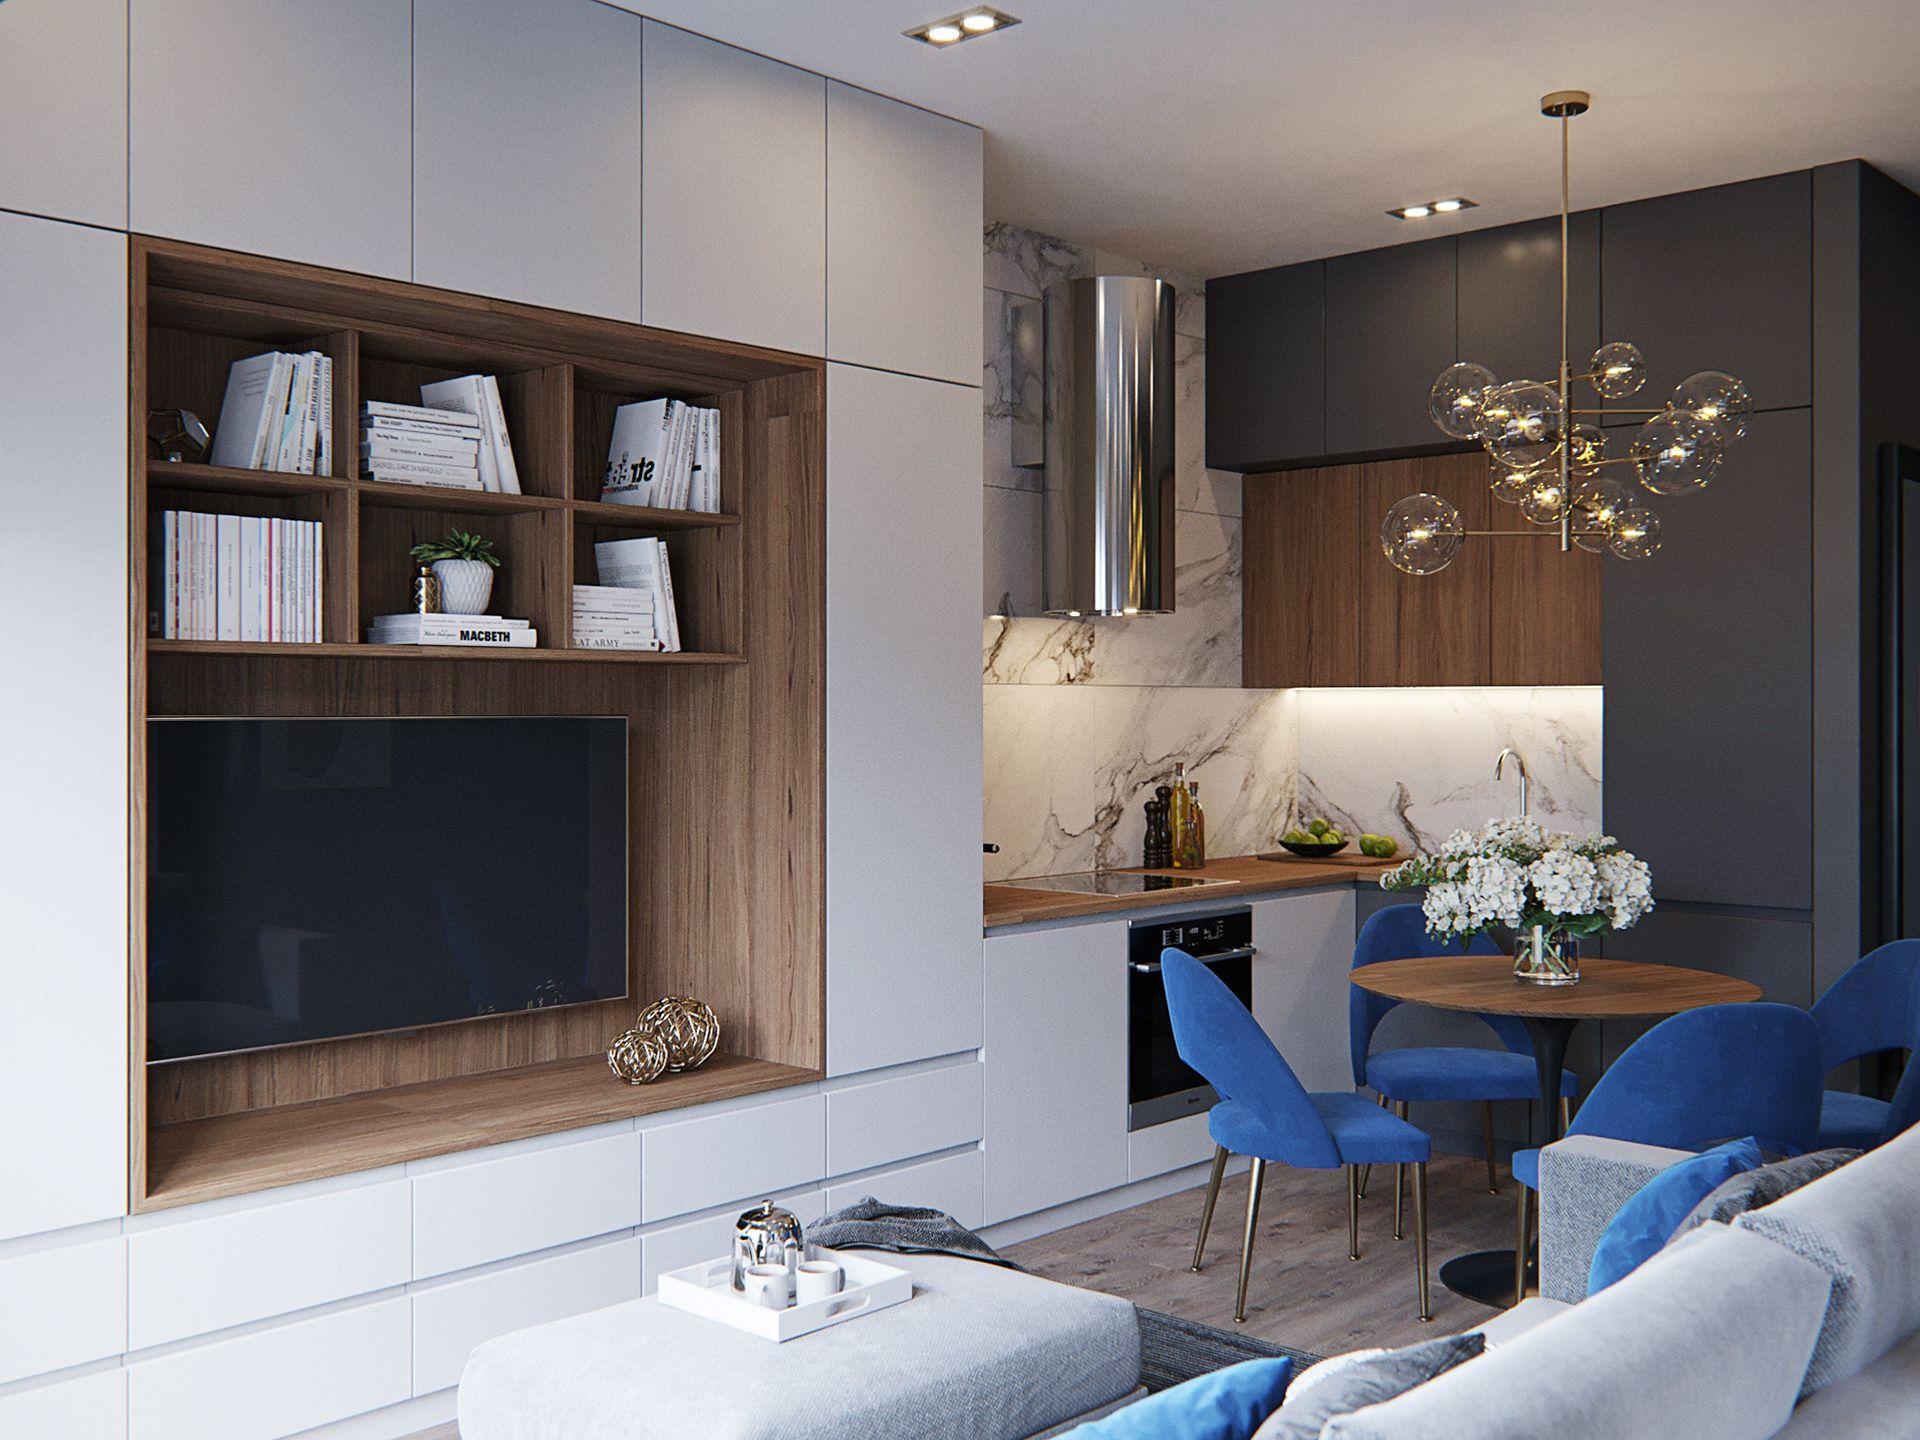 Small loft on Behance Small apartment interior, Small